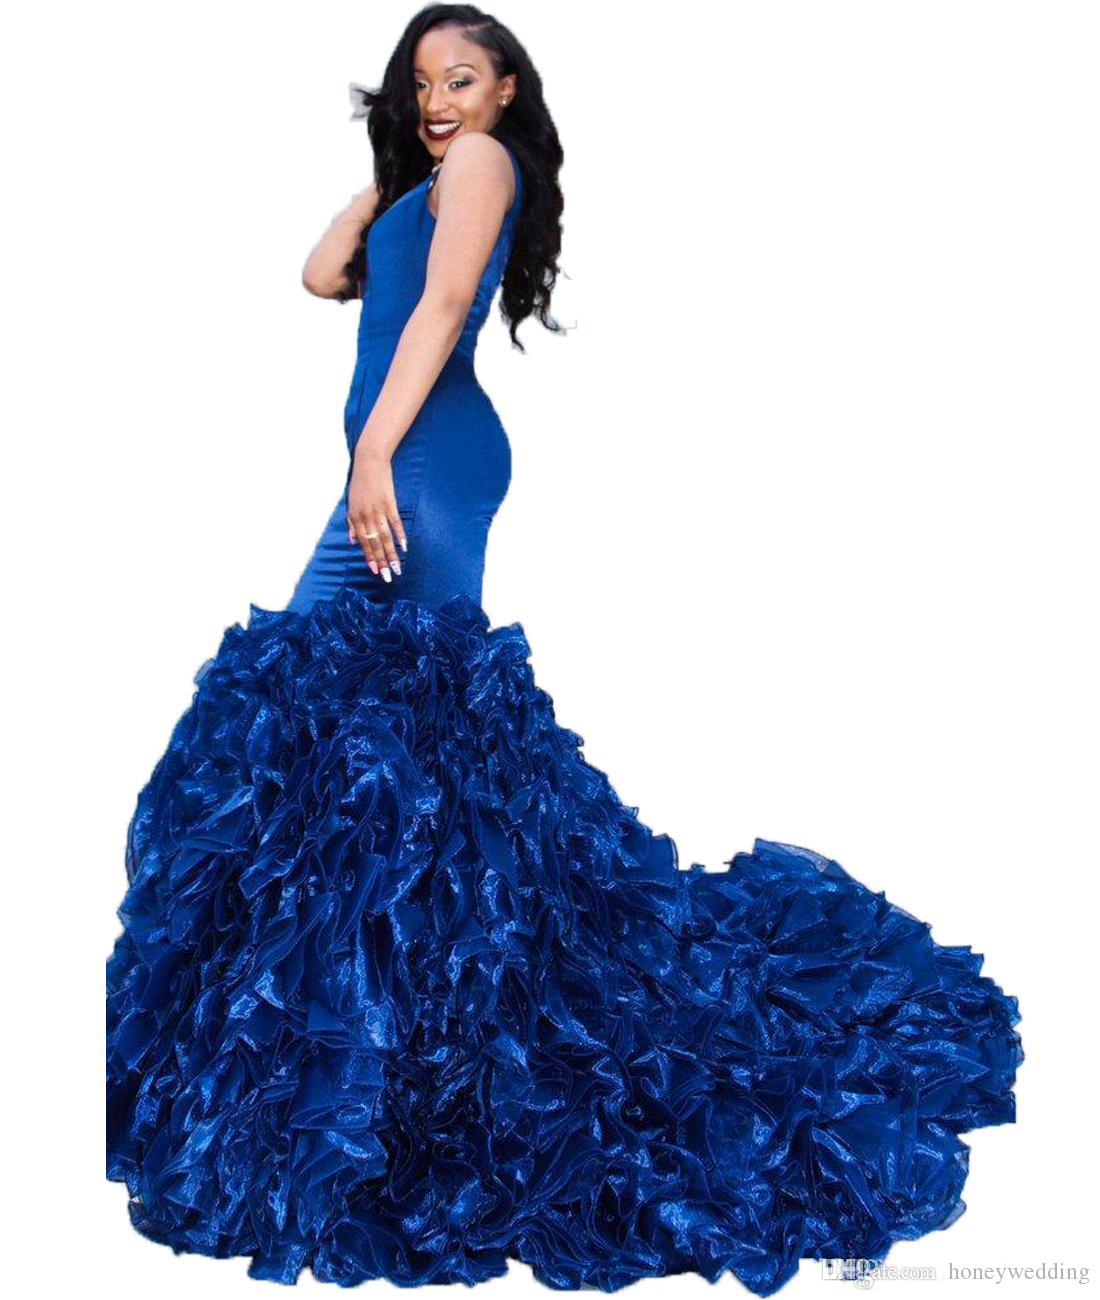 2019 Royal Blue Prom Dresses Evening Gowns Sexy Deep V Neck Sleeveless Mermaid Ruffles Organza Skirt Formal Party Dresses